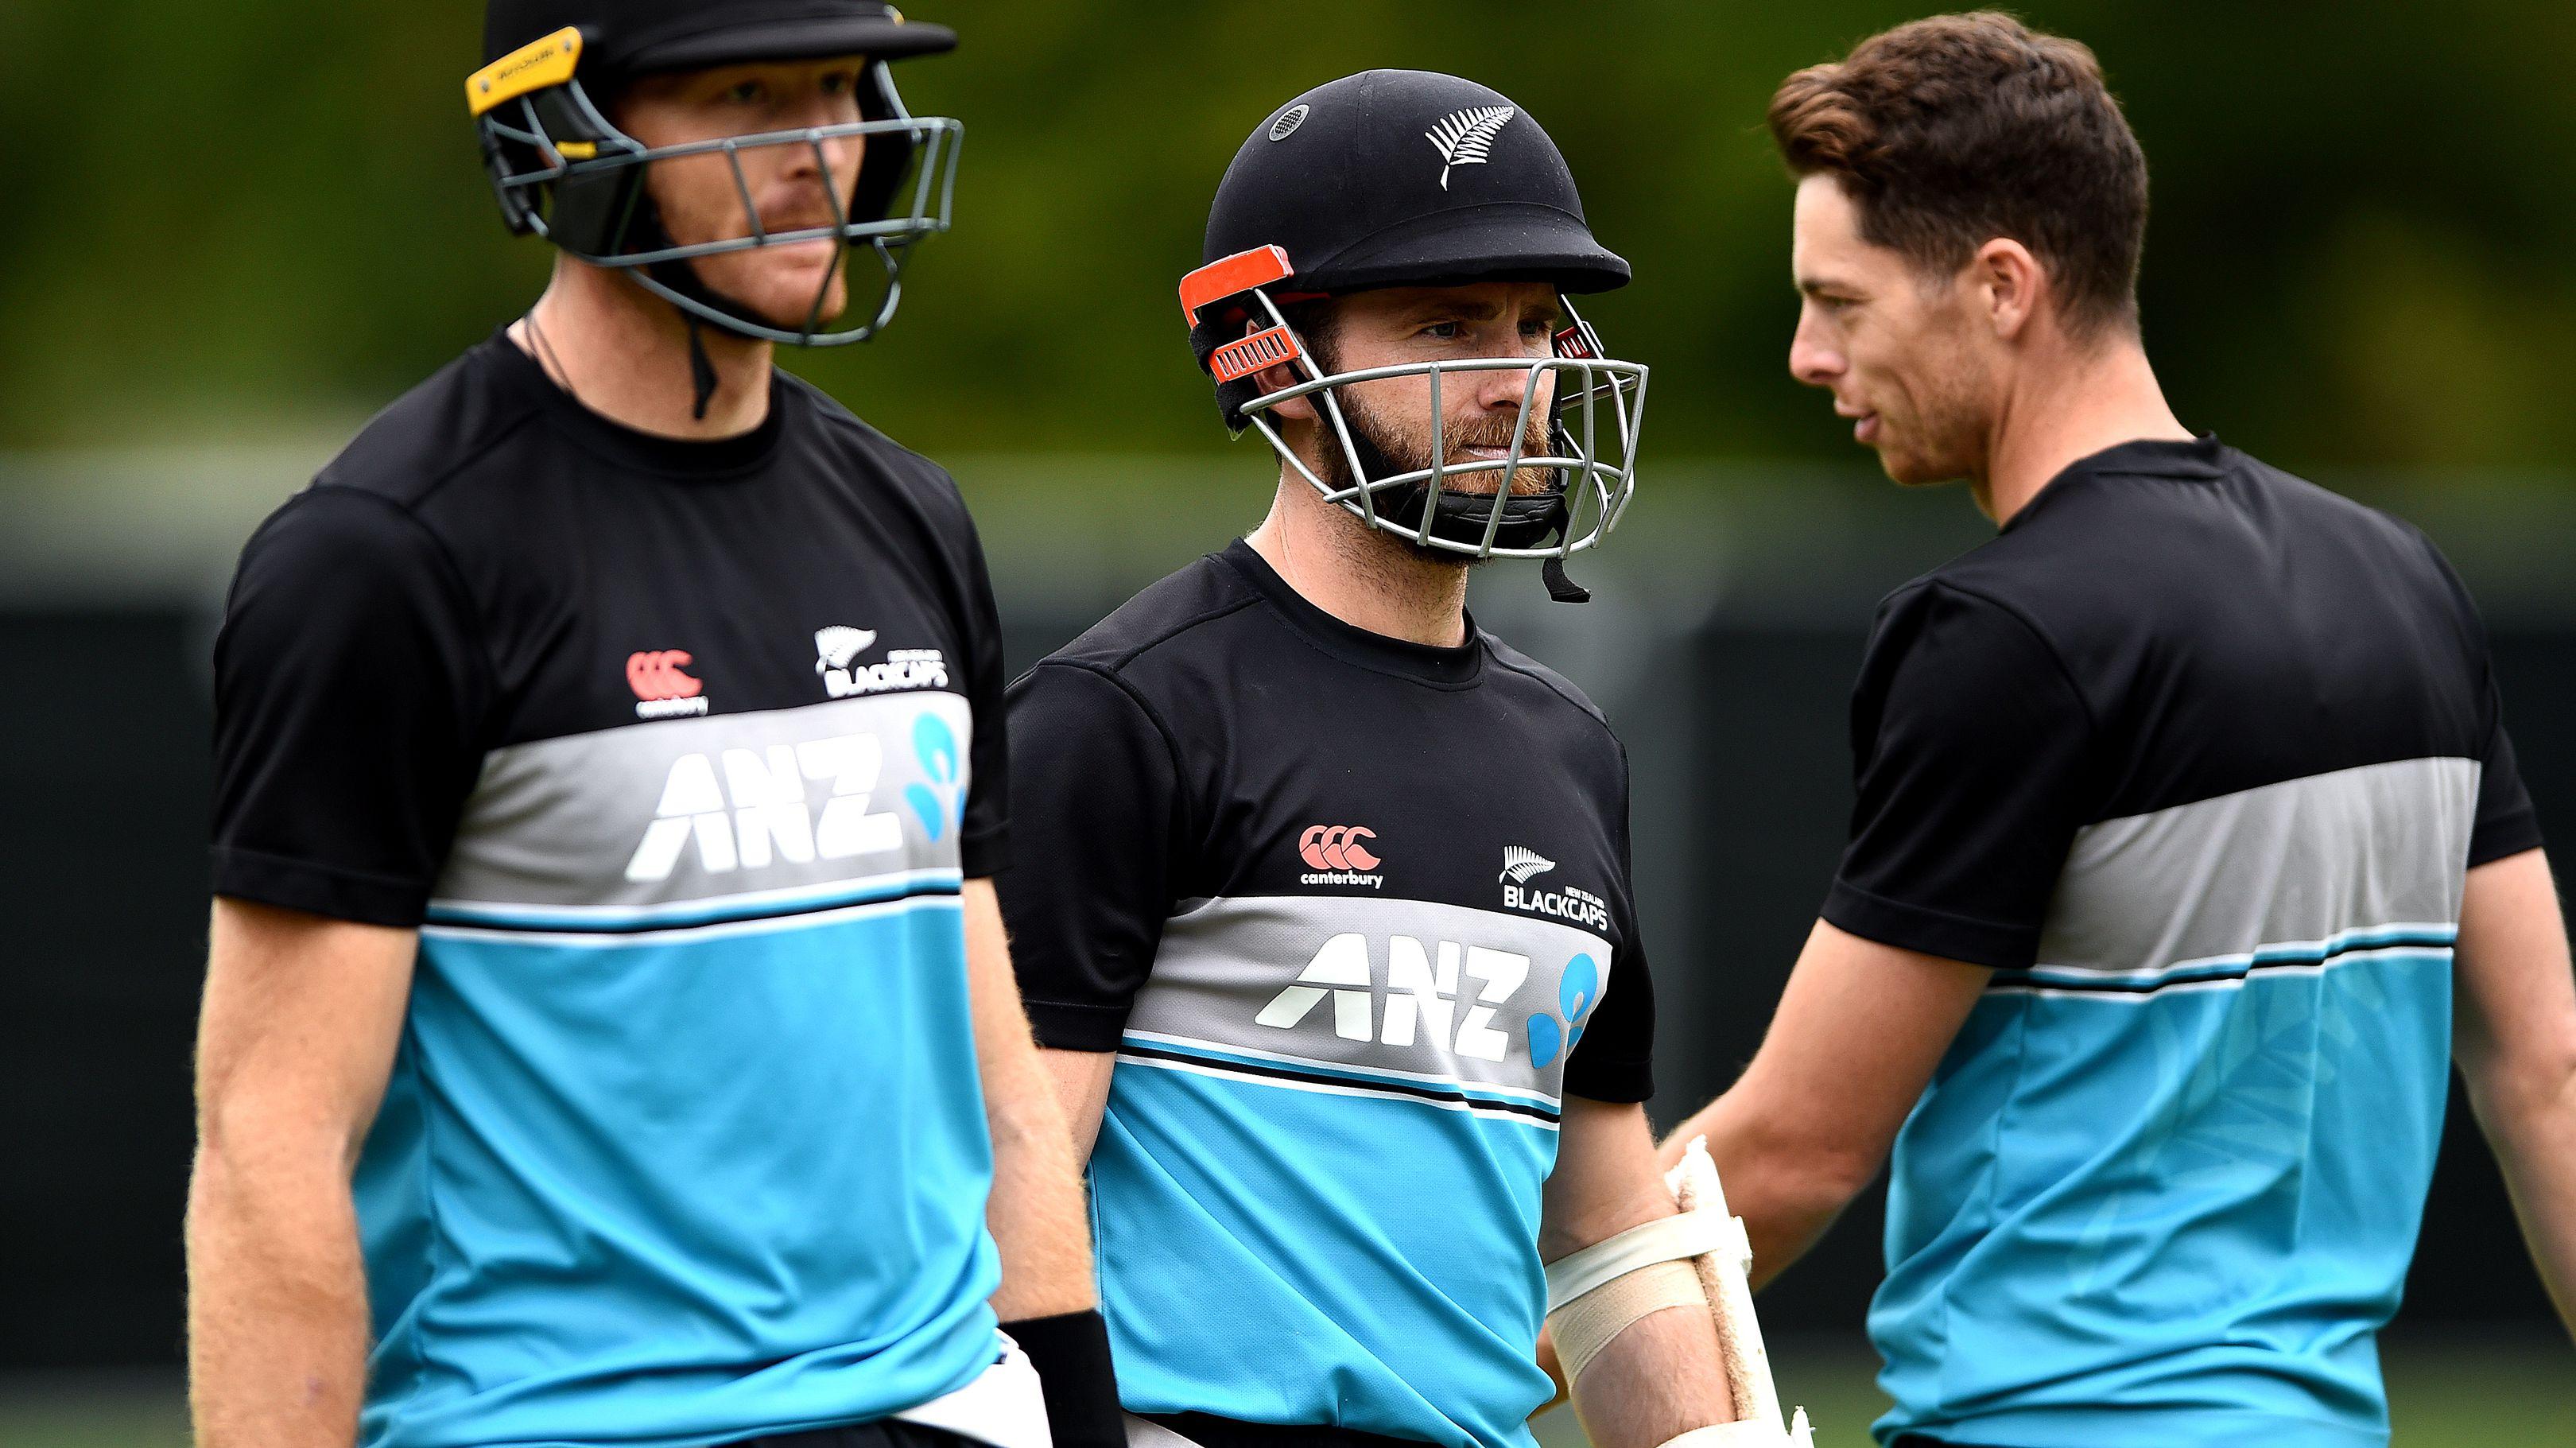 Cricket tour sensationally abandoned